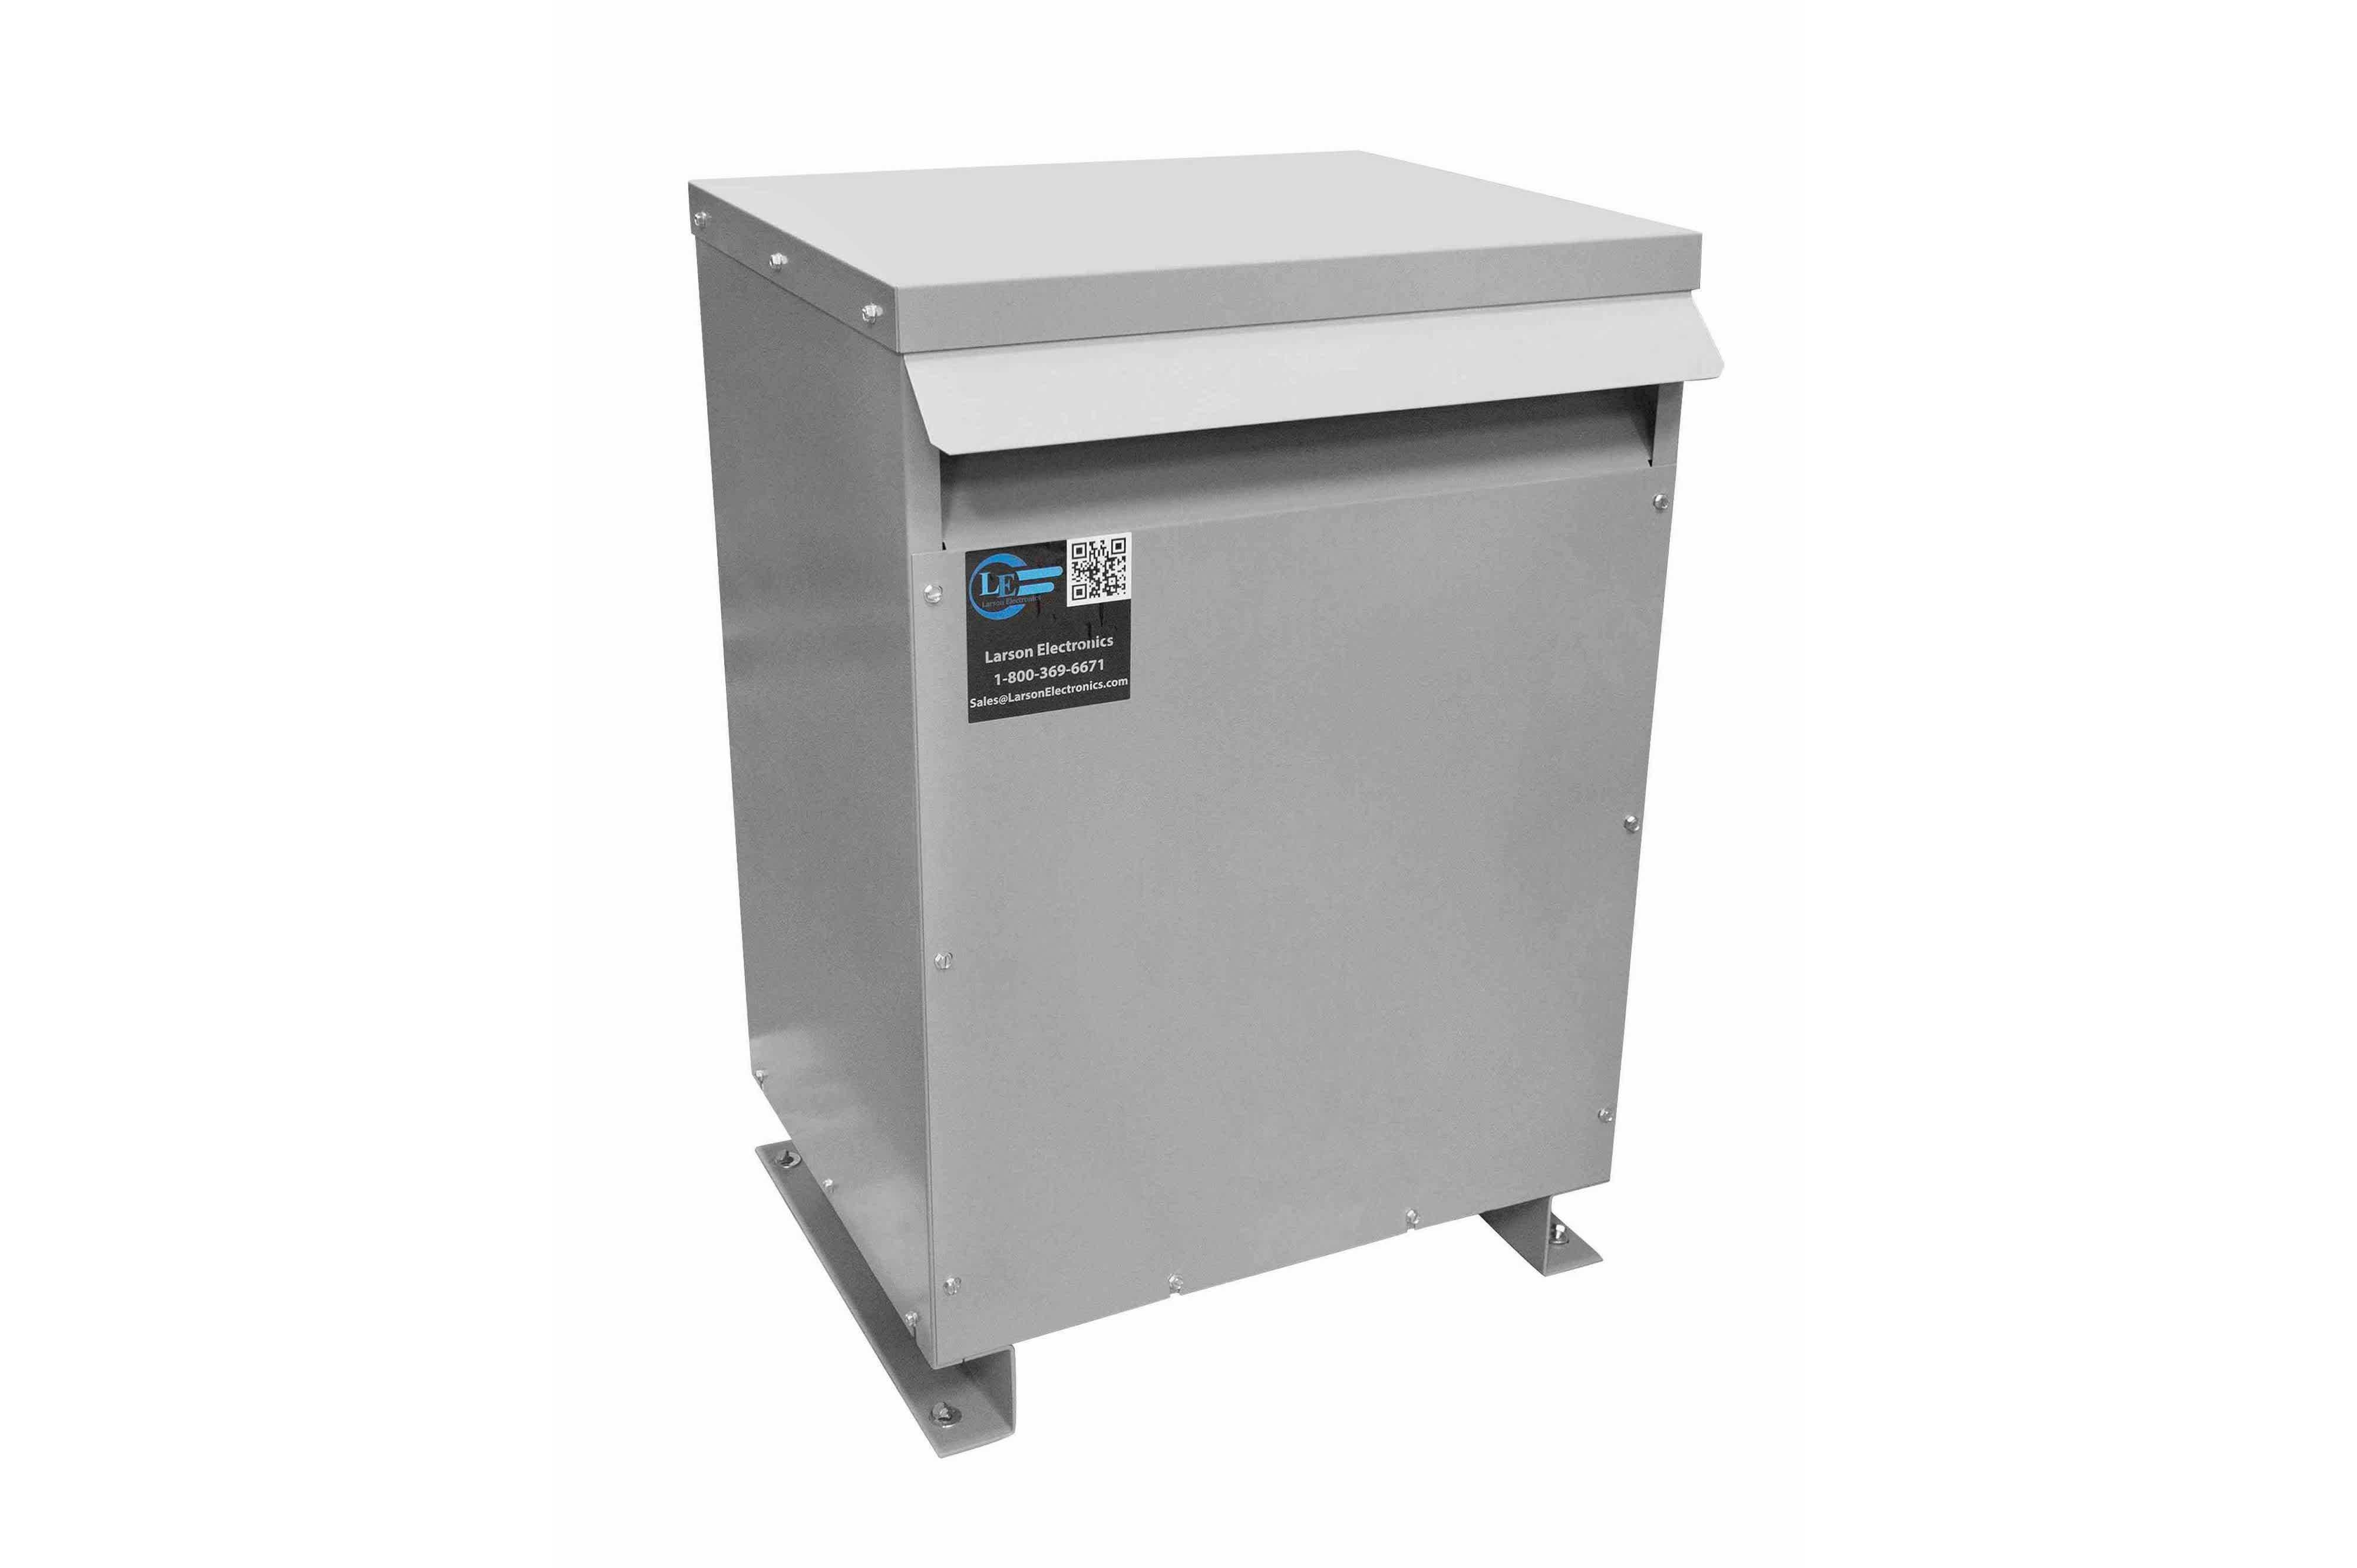 35 kVA 3PH Isolation Transformer, 208V Wye Primary, 415V Delta Secondary, N3R, Ventilated, 60 Hz